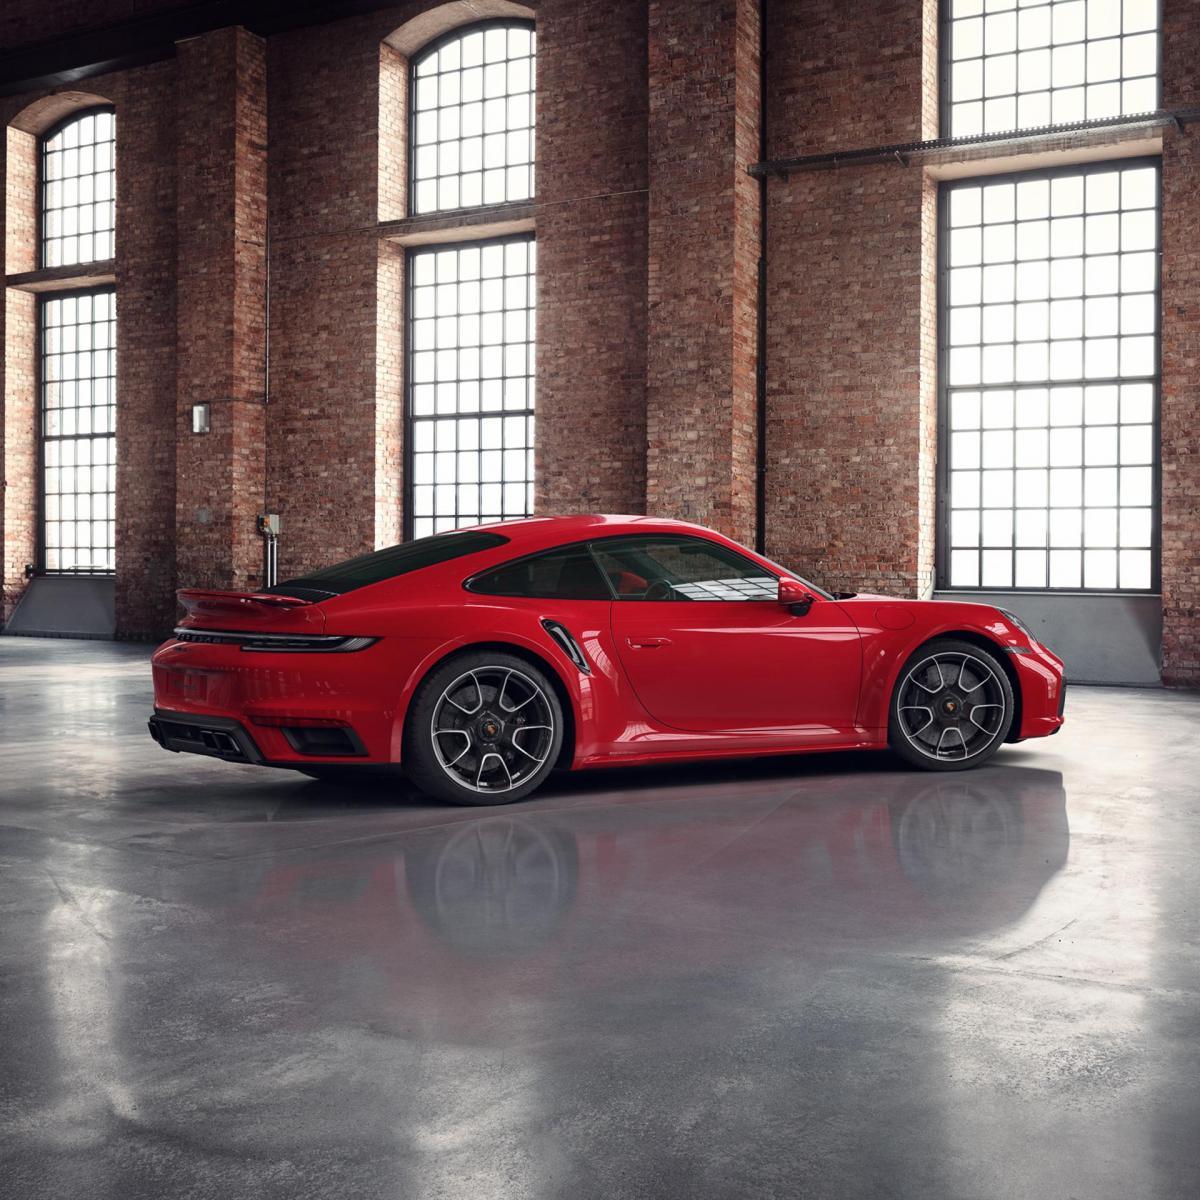 Porsche 911 Turbo S 2020 - Guards Red